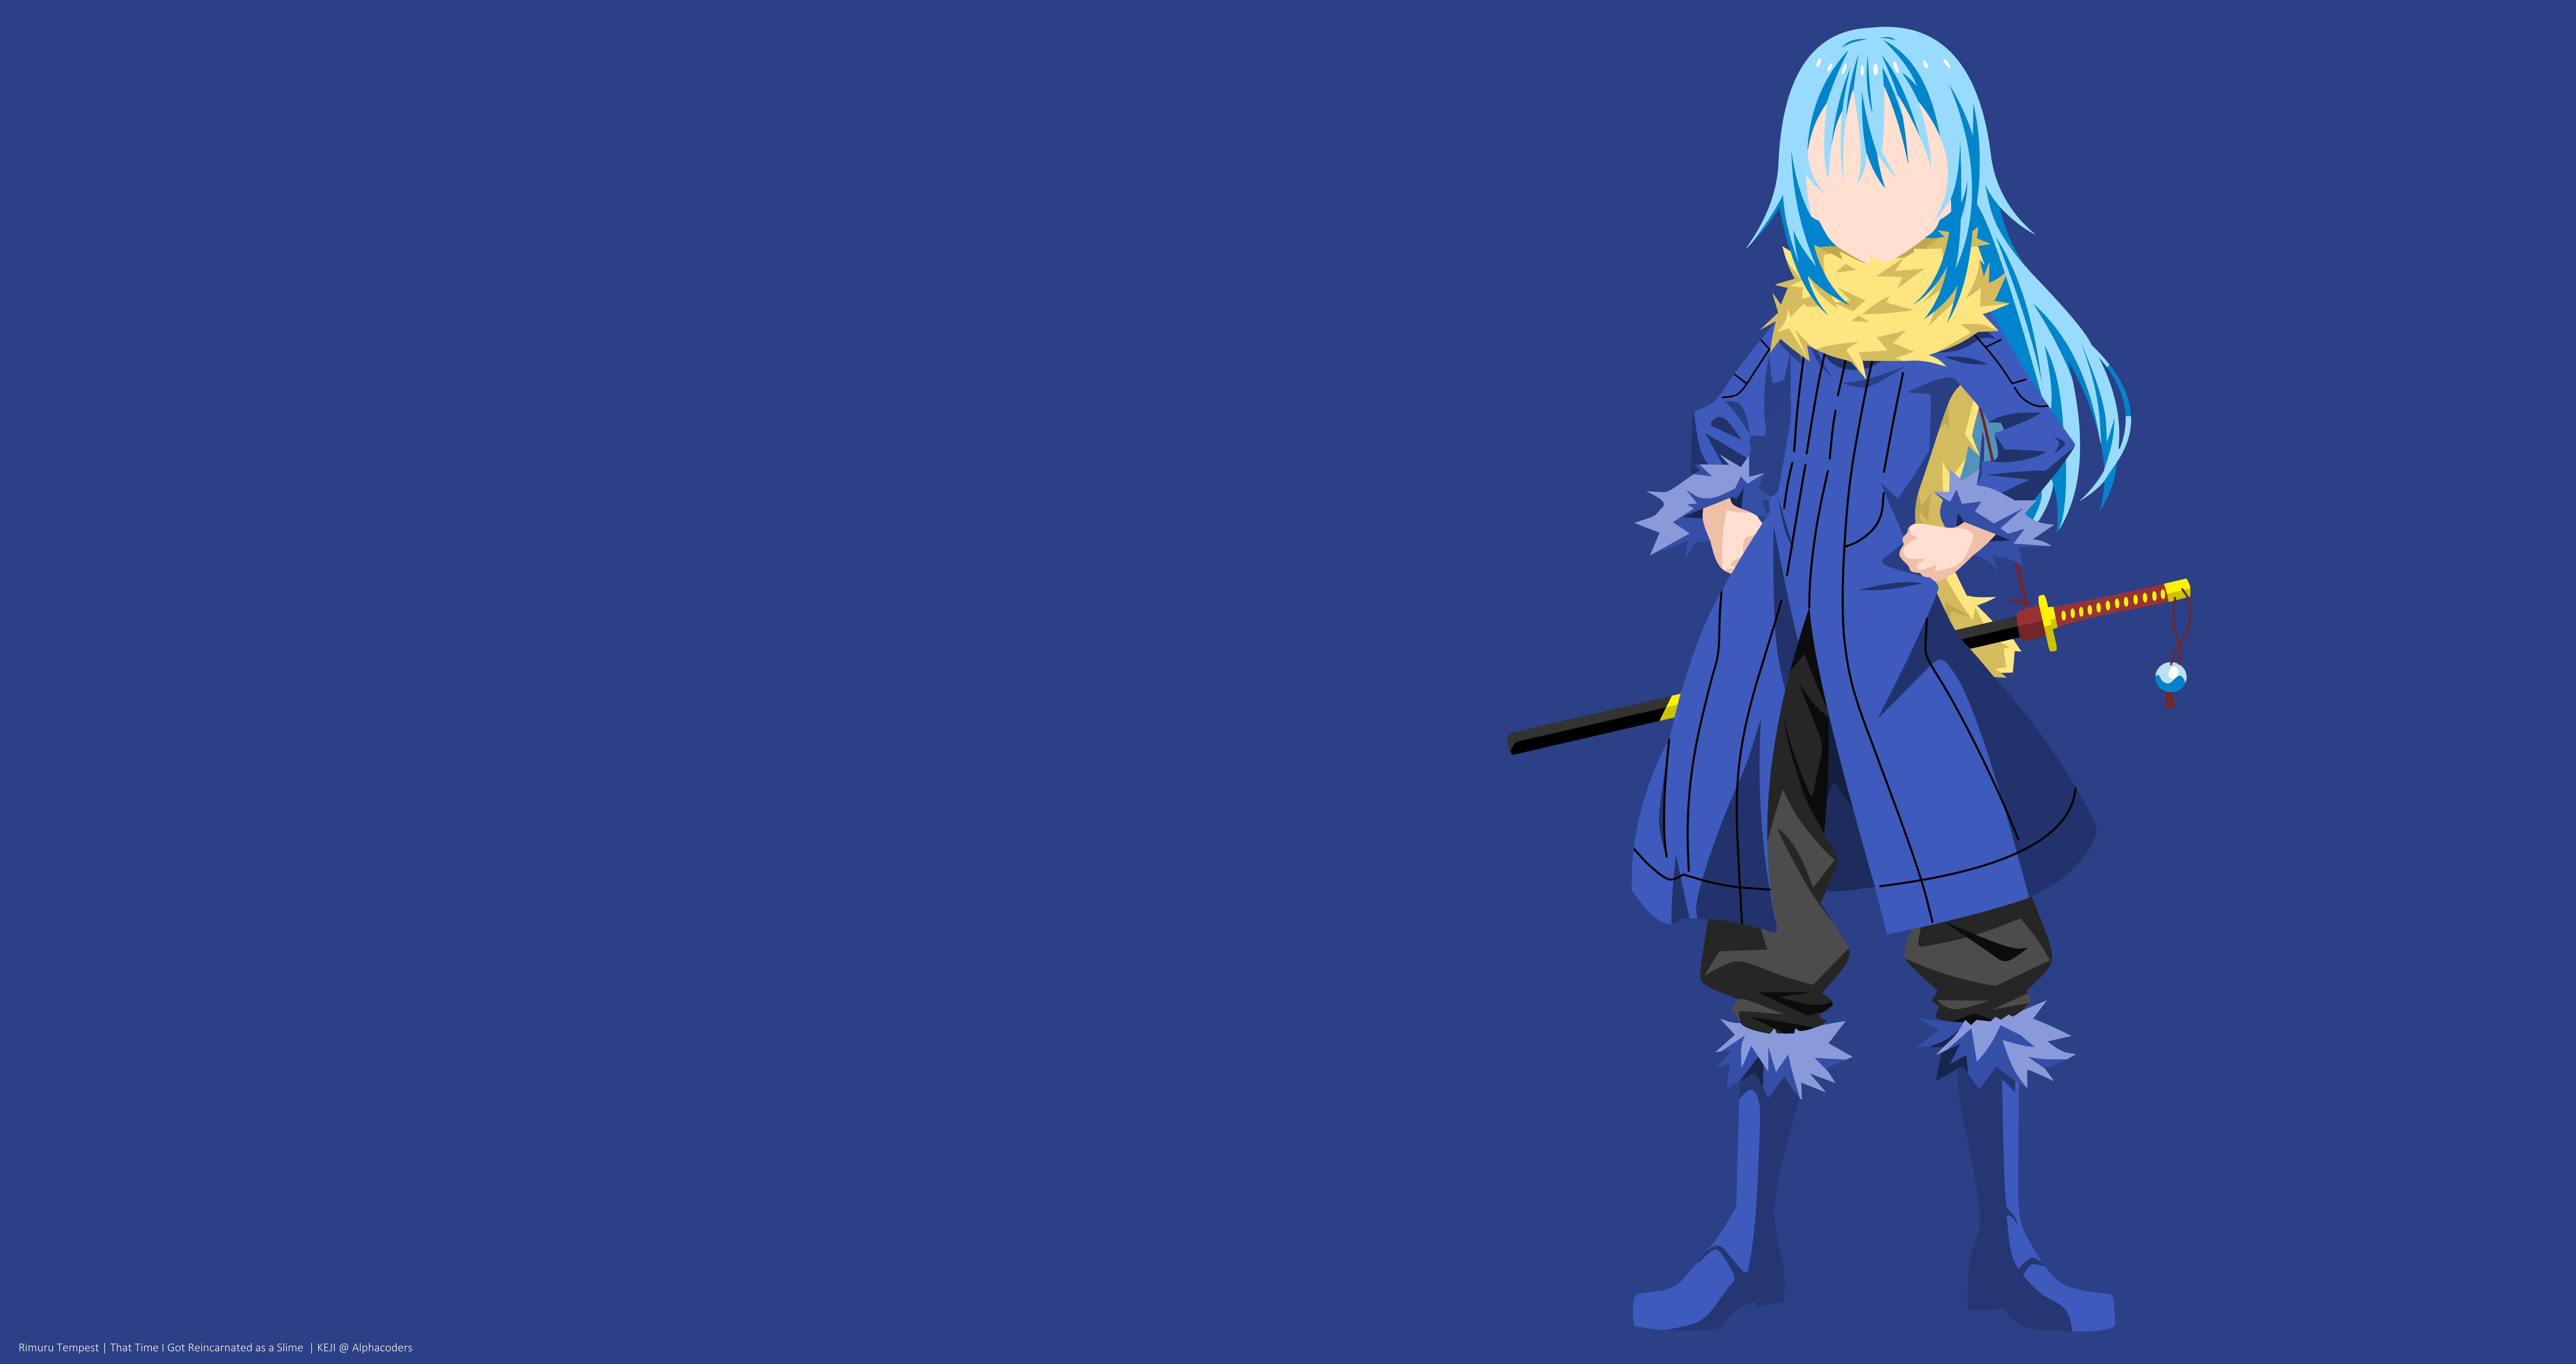 Anime That Time I Got Reincarnated As A Slime Girl Minimalist Rimuru Tempest Sword Tensei Shitara Slime Datta Ken 8k Wallpa Slime Slime Wallpaper Tempest